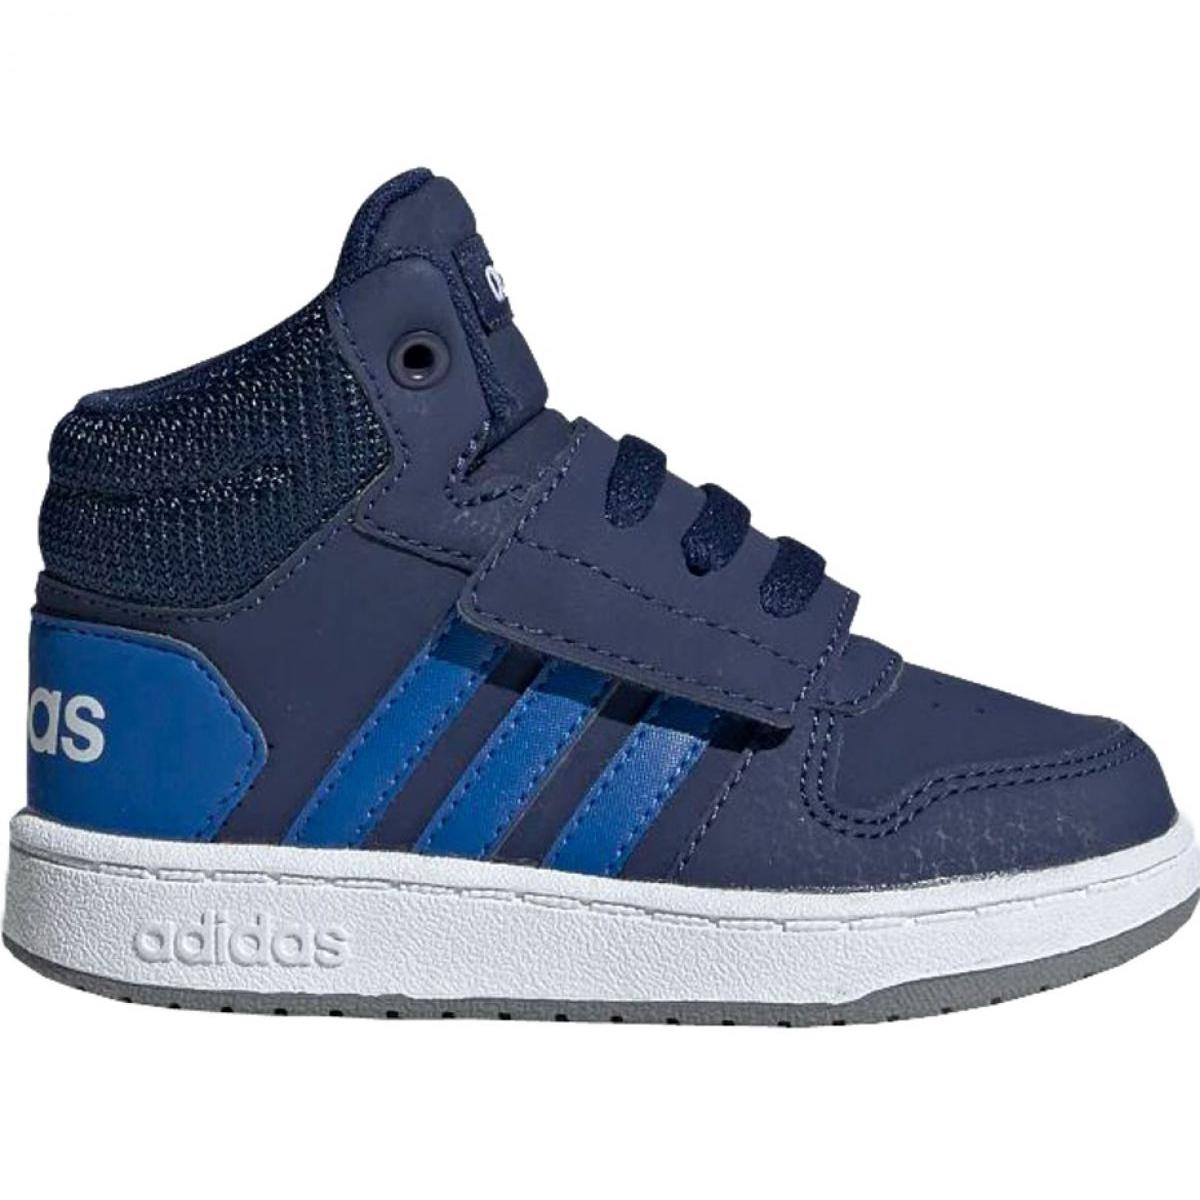 Neu adidas NEO Kinder Sneakers VS Hoops 6052508 für Jungen